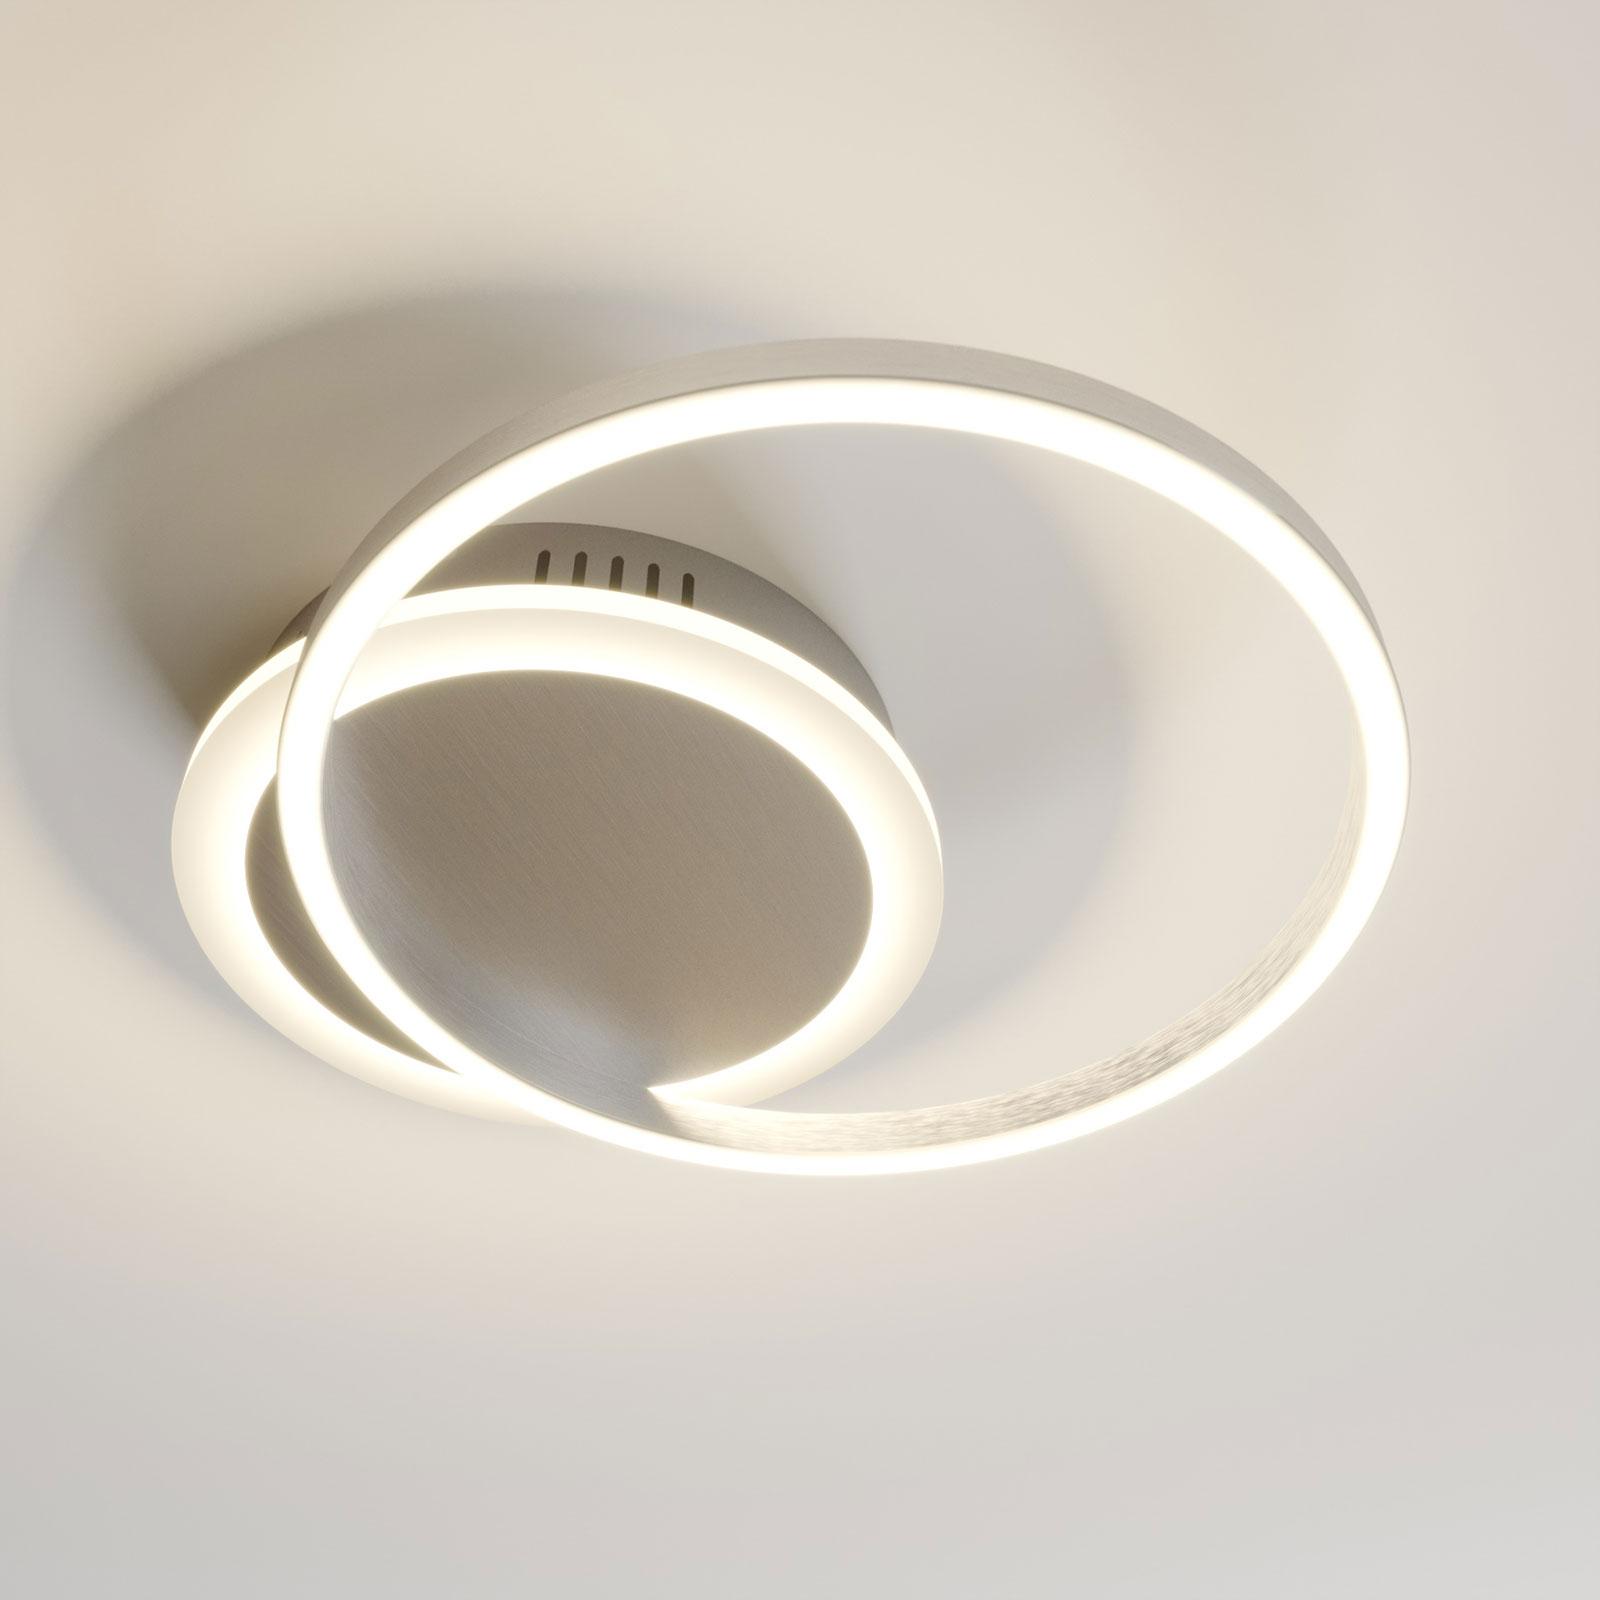 Lindby Smart Uzma LED-Deckenleuchte